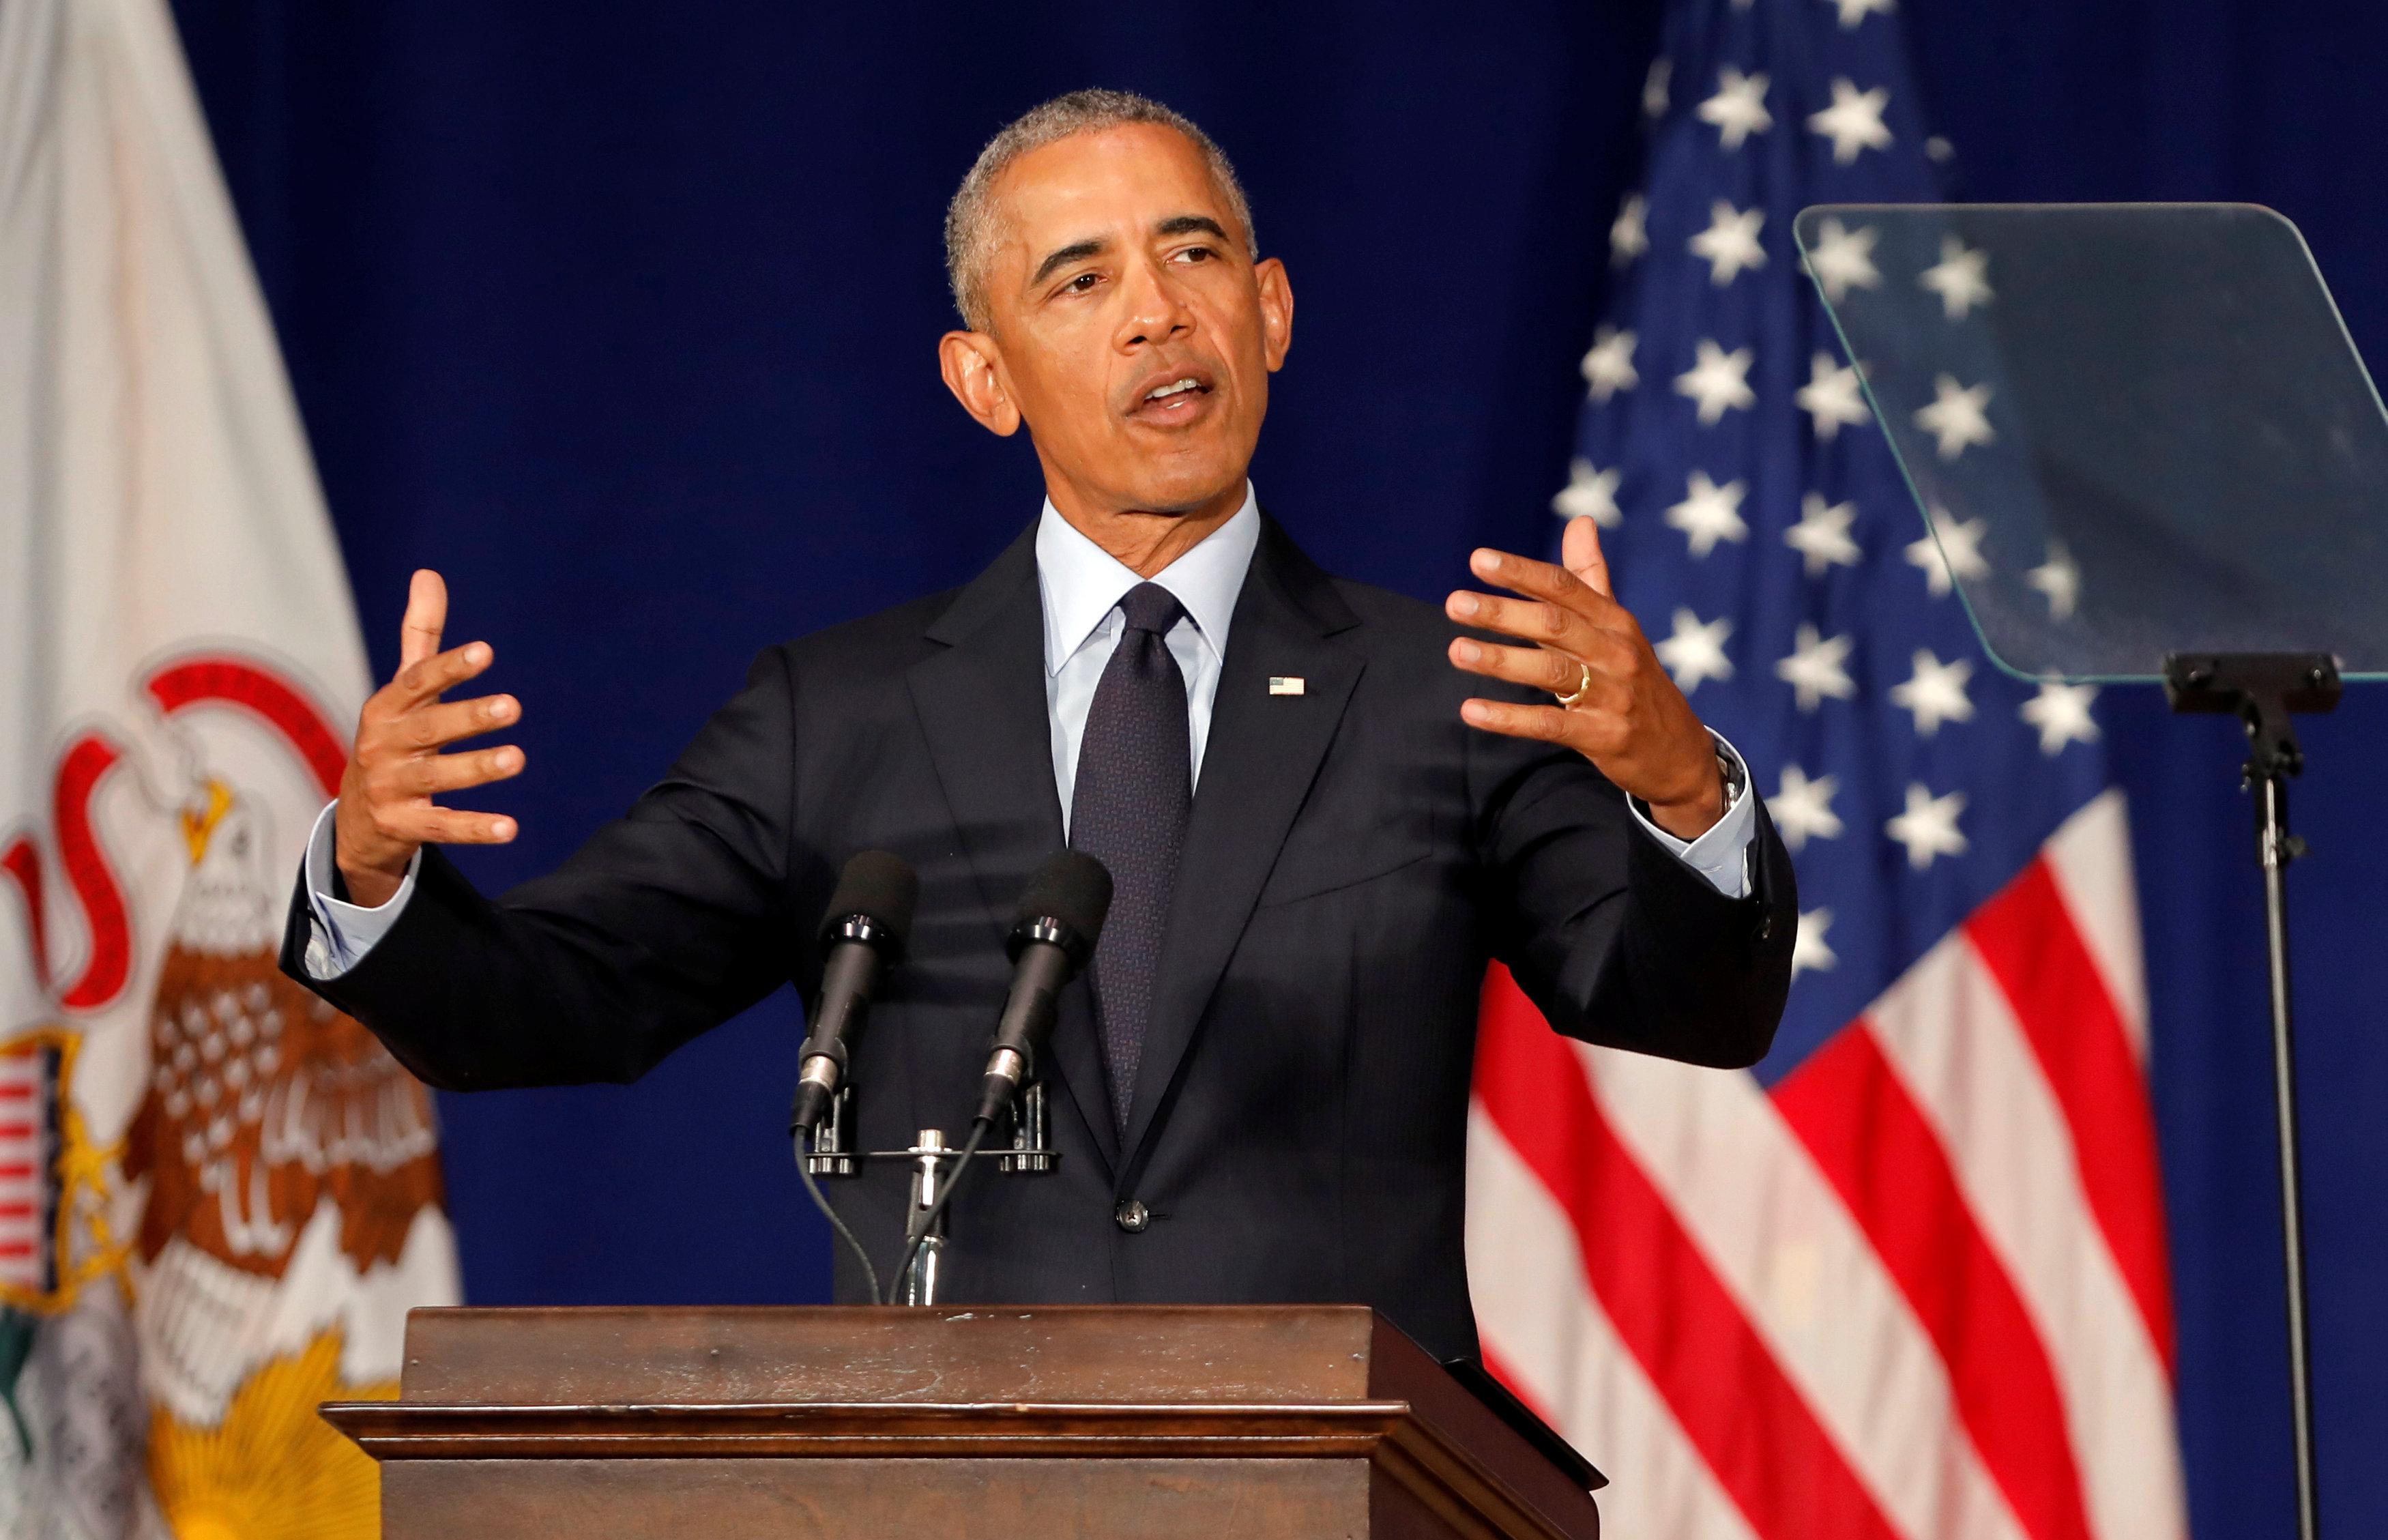 Former US President Barack Obama speaks at the University of Illinois Urbana-Champaign in Urbana, Illinois, US, September 7, 2018